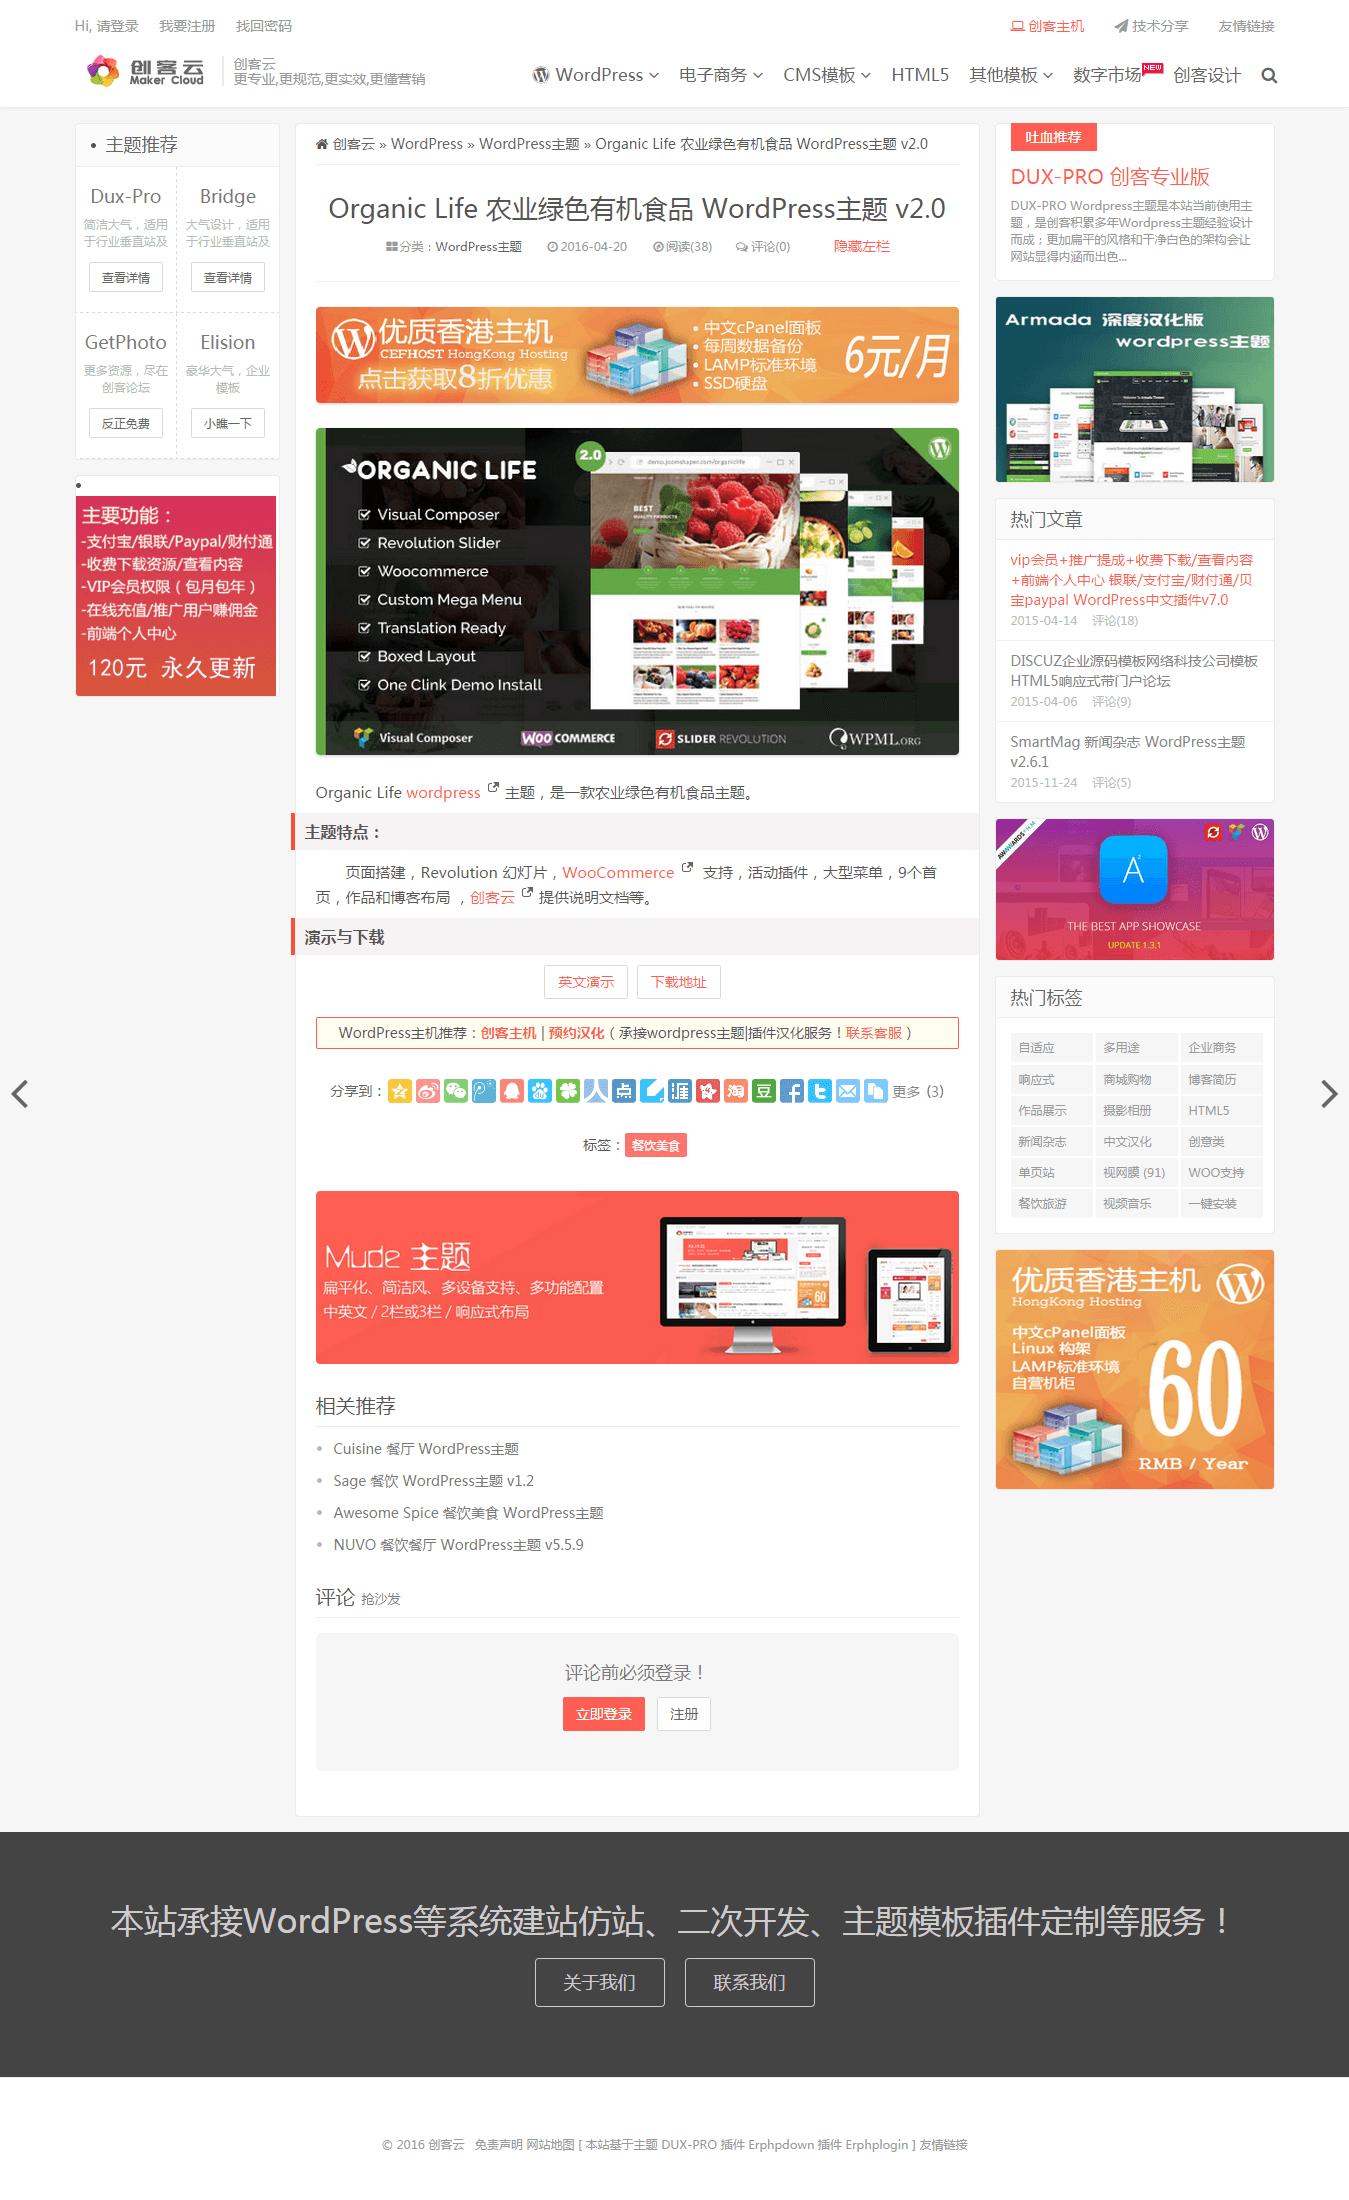 【WordPress主题】DUX-PRO创客云美化开发版v2.0